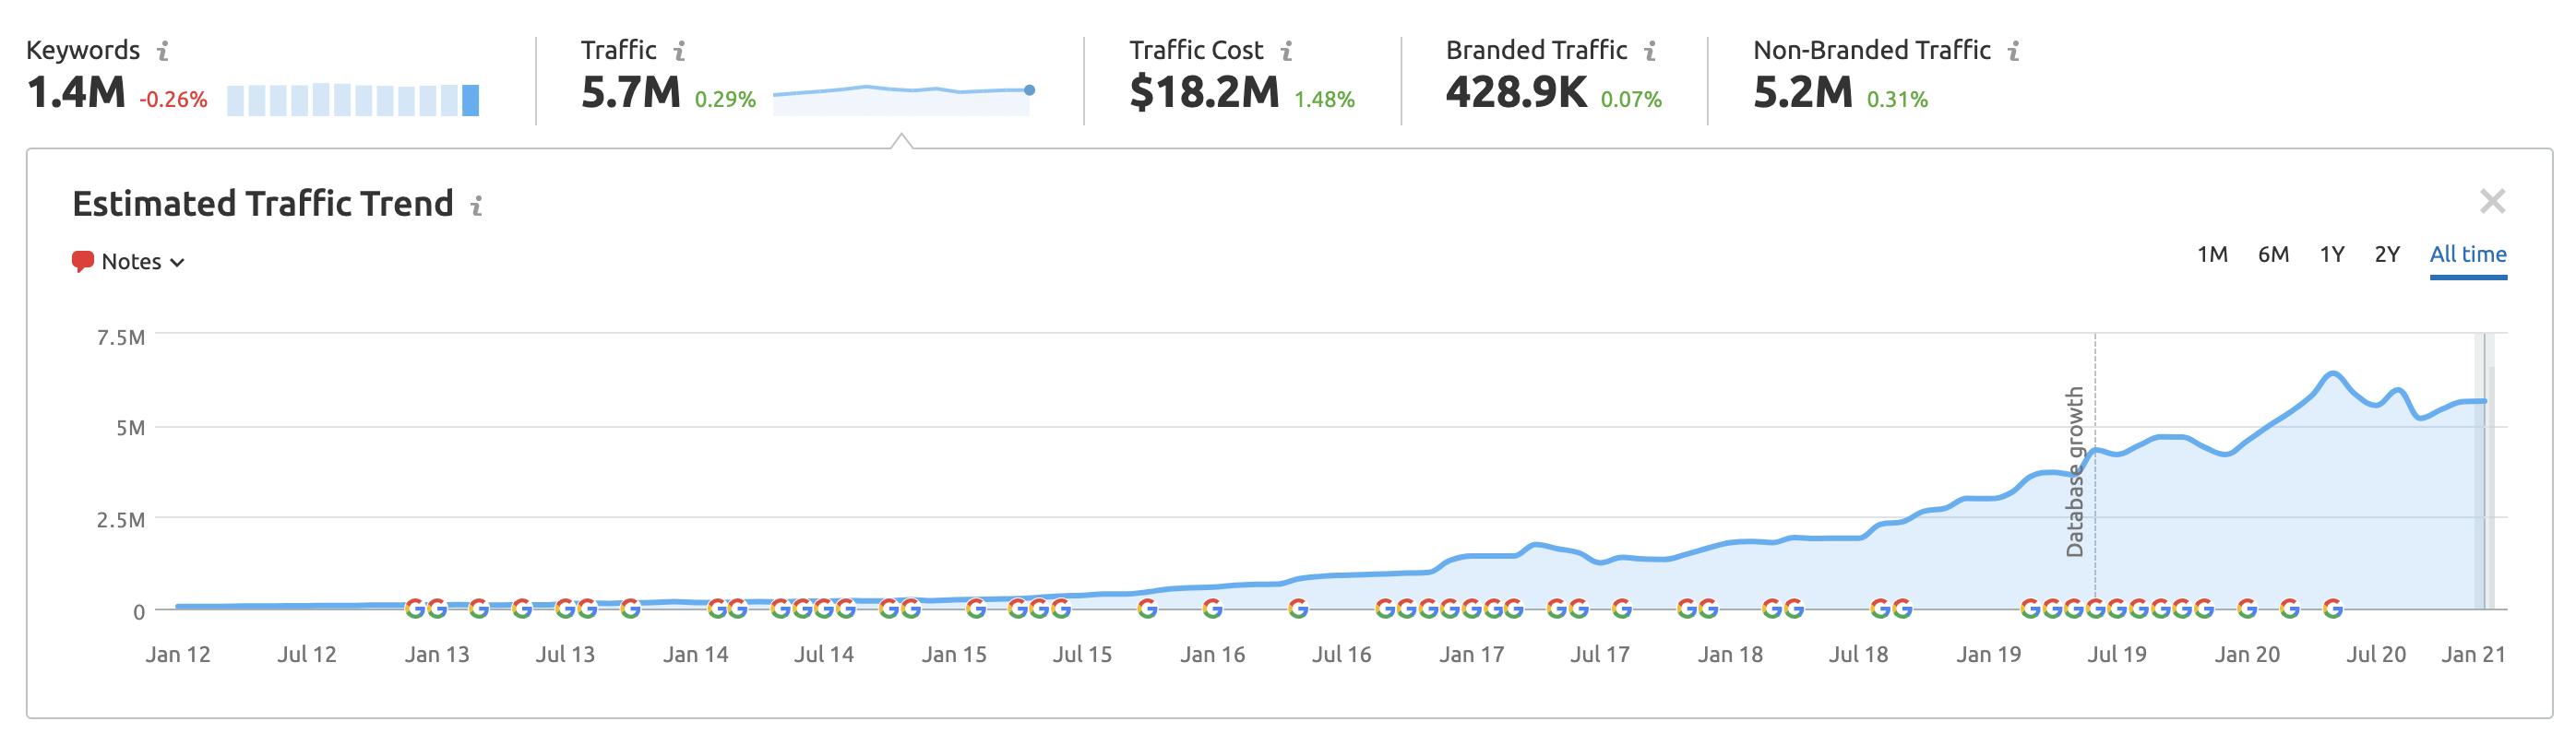 Organic Research Estimated Traffic Trend